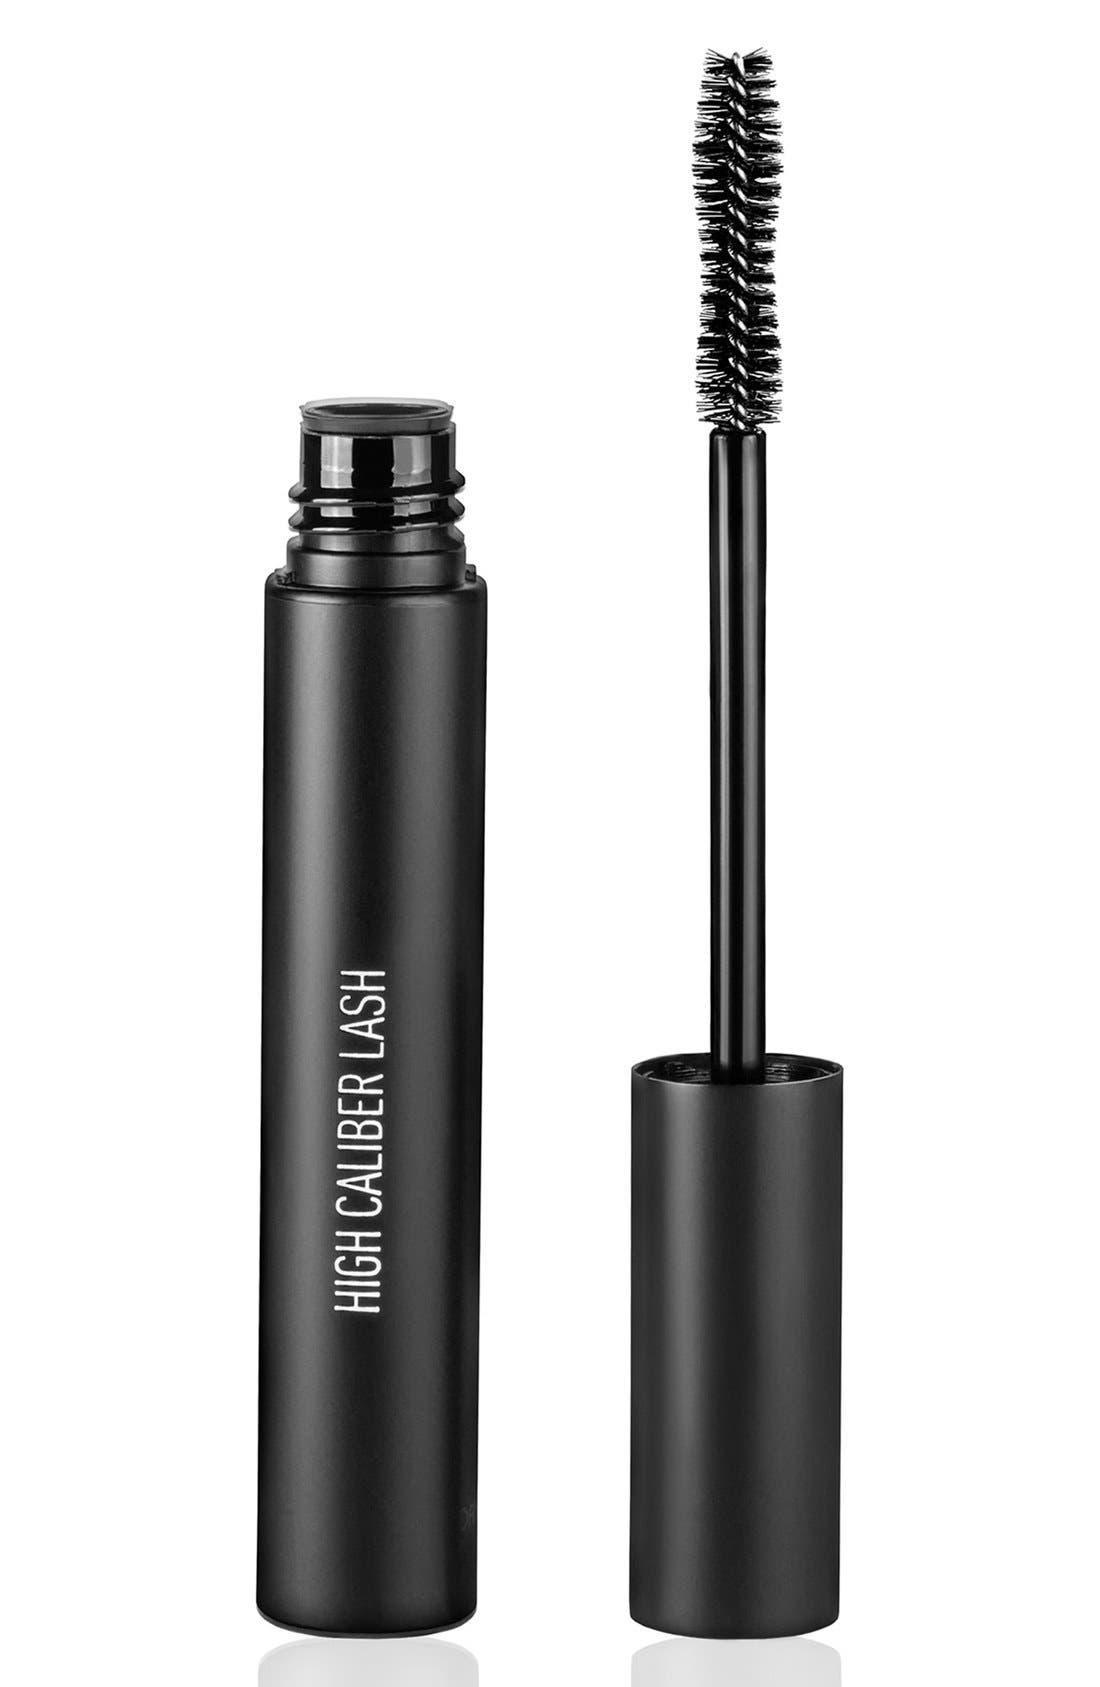 Sigma Beauty High Caliber Lash Mascara